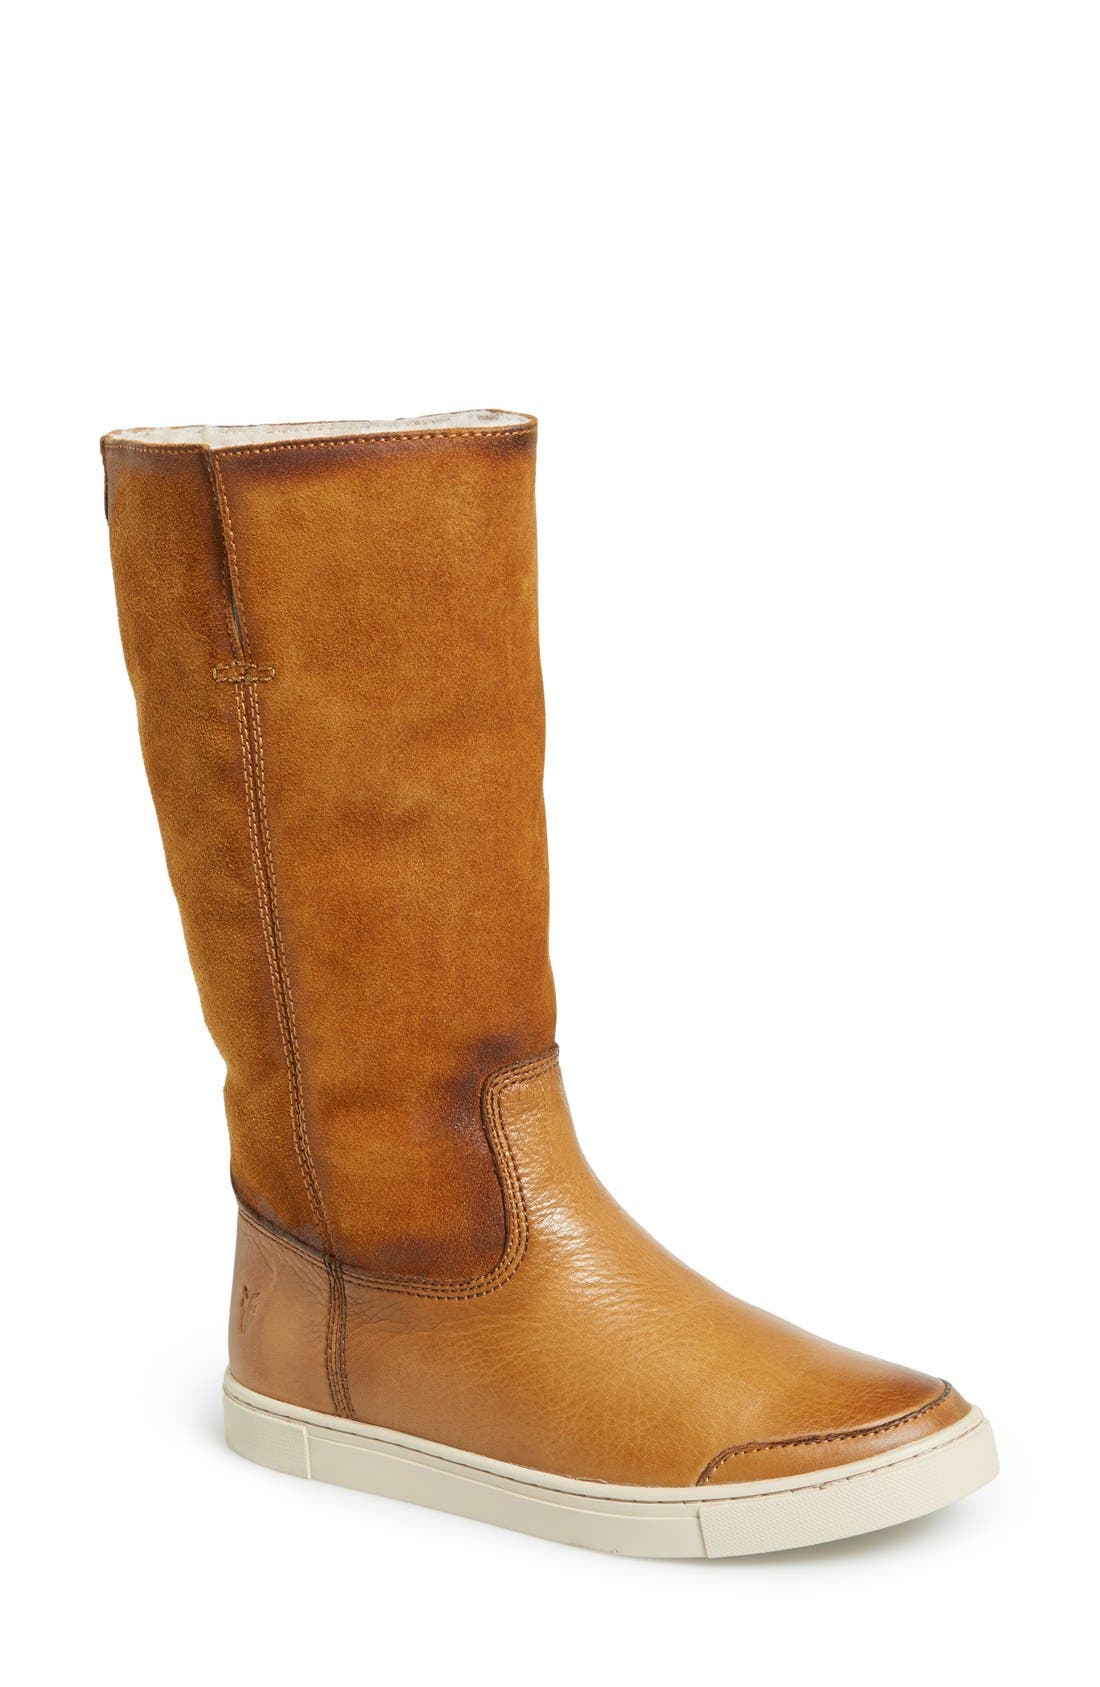 Main Image - Frye 'Gemma' Tall Genuine Shearling Lined Boot (Women)